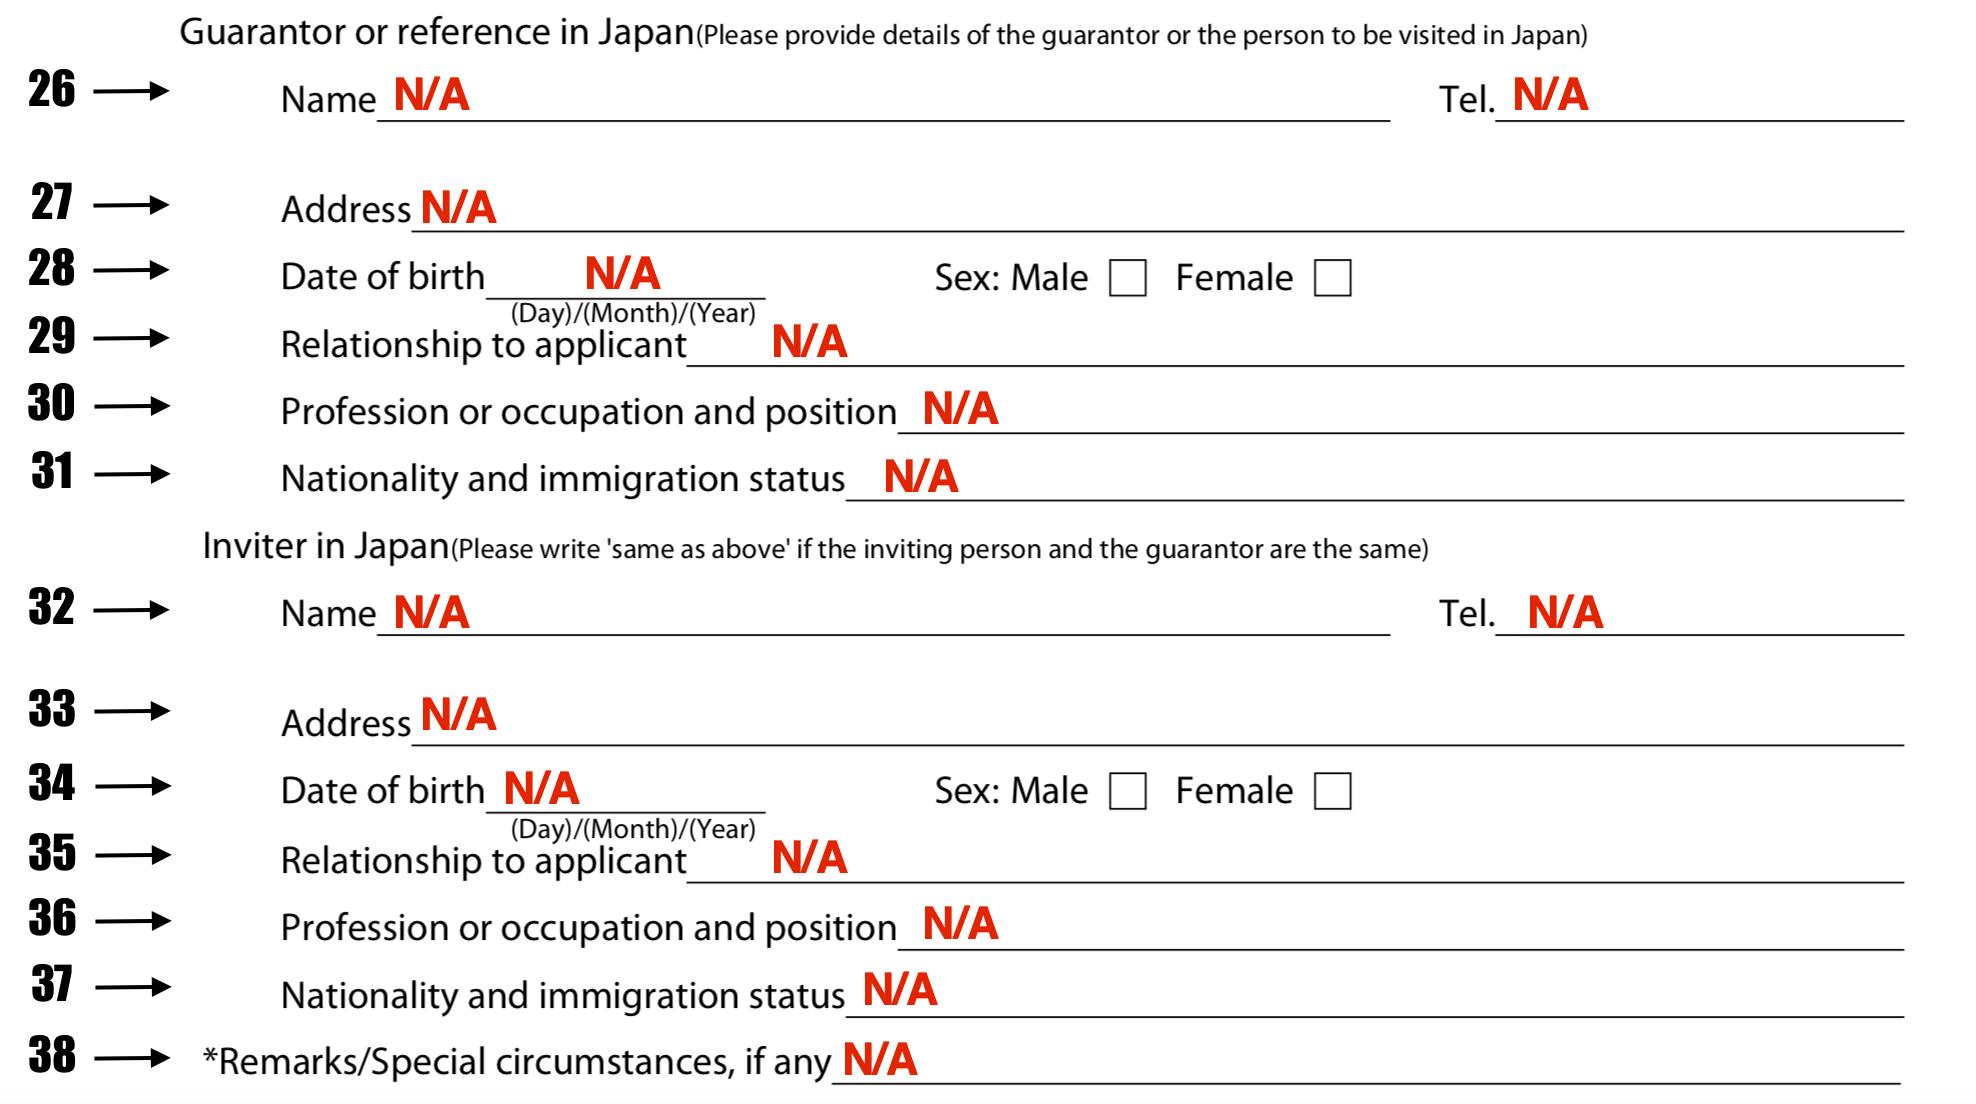 guarantor-inviter-japan-visa-application-form.png